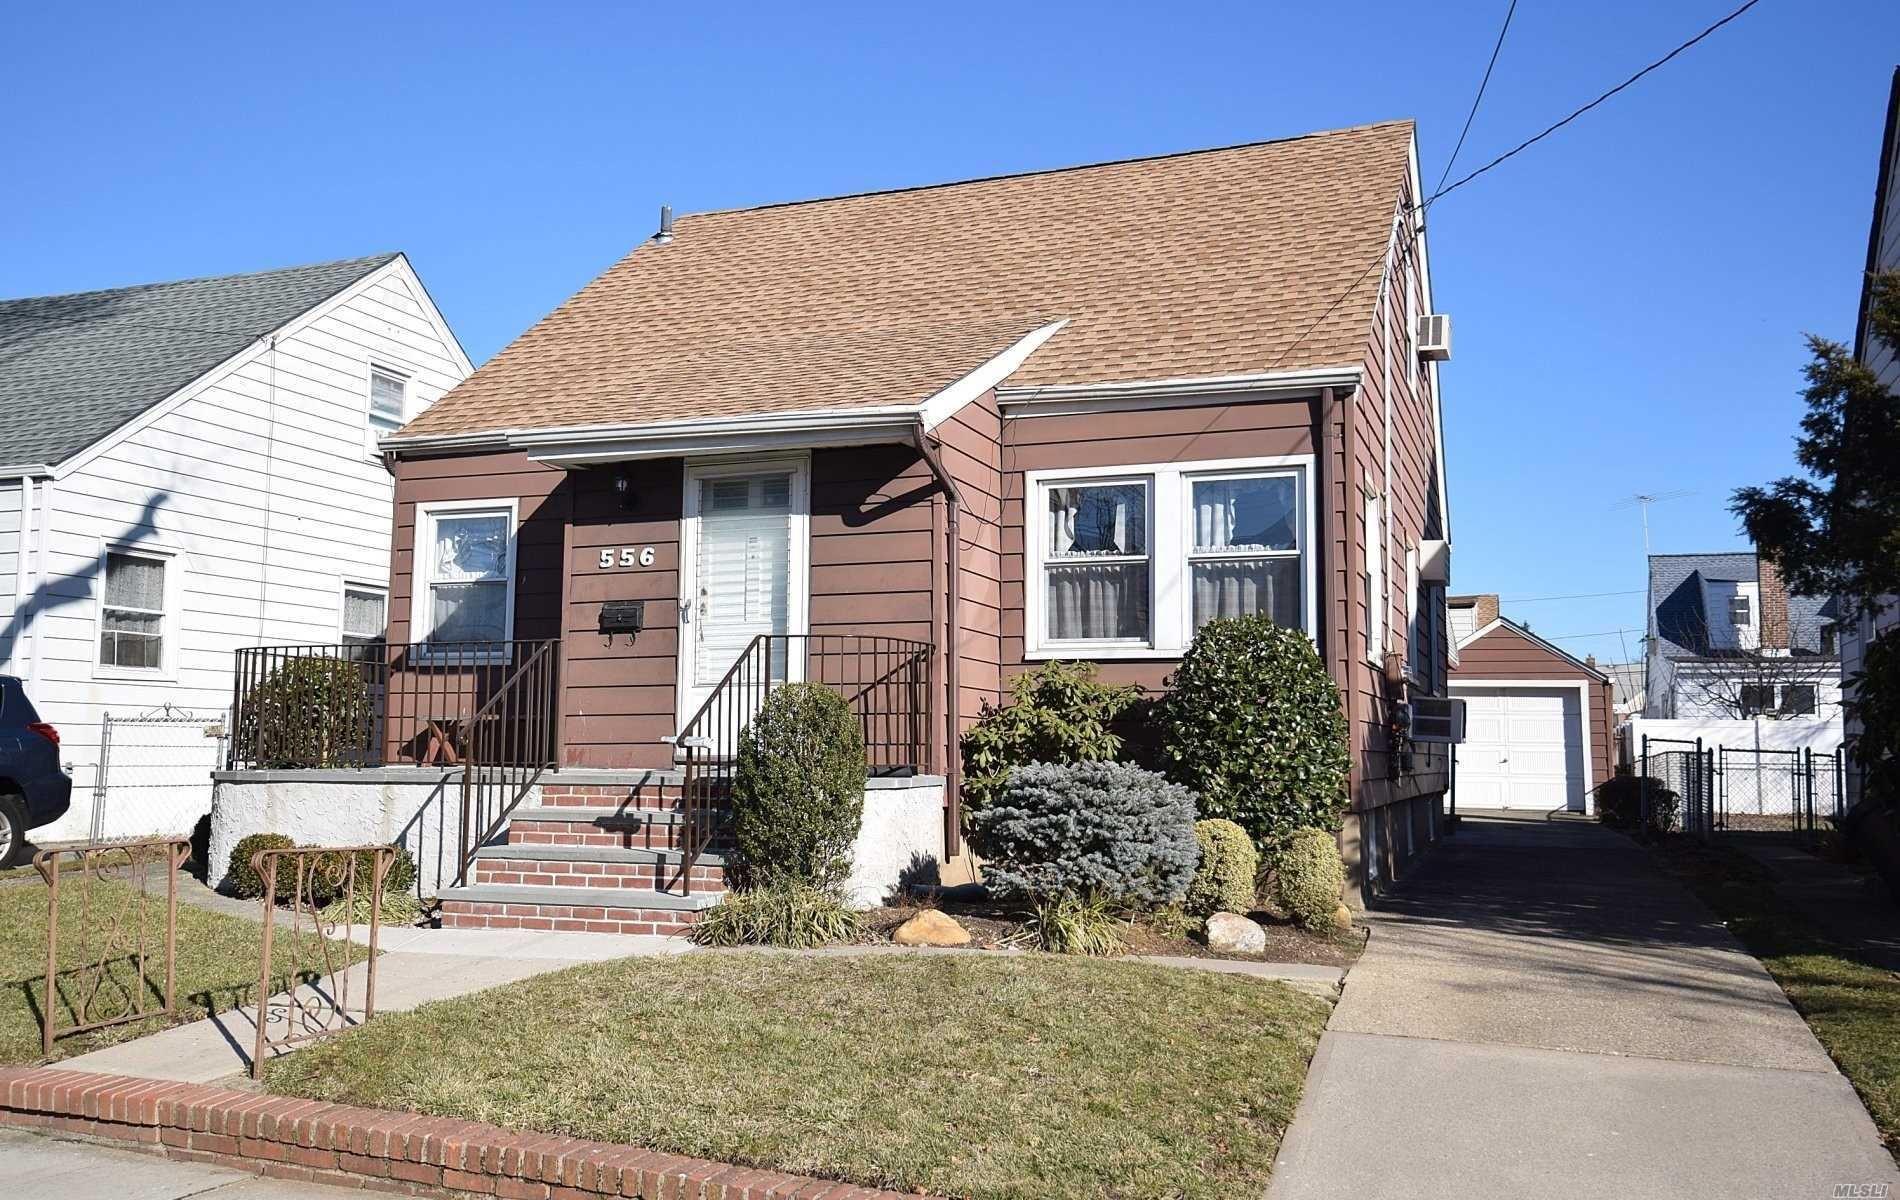 556 N 5th Street, New Hyde Park, NY 11040 - MLS#: 3197430